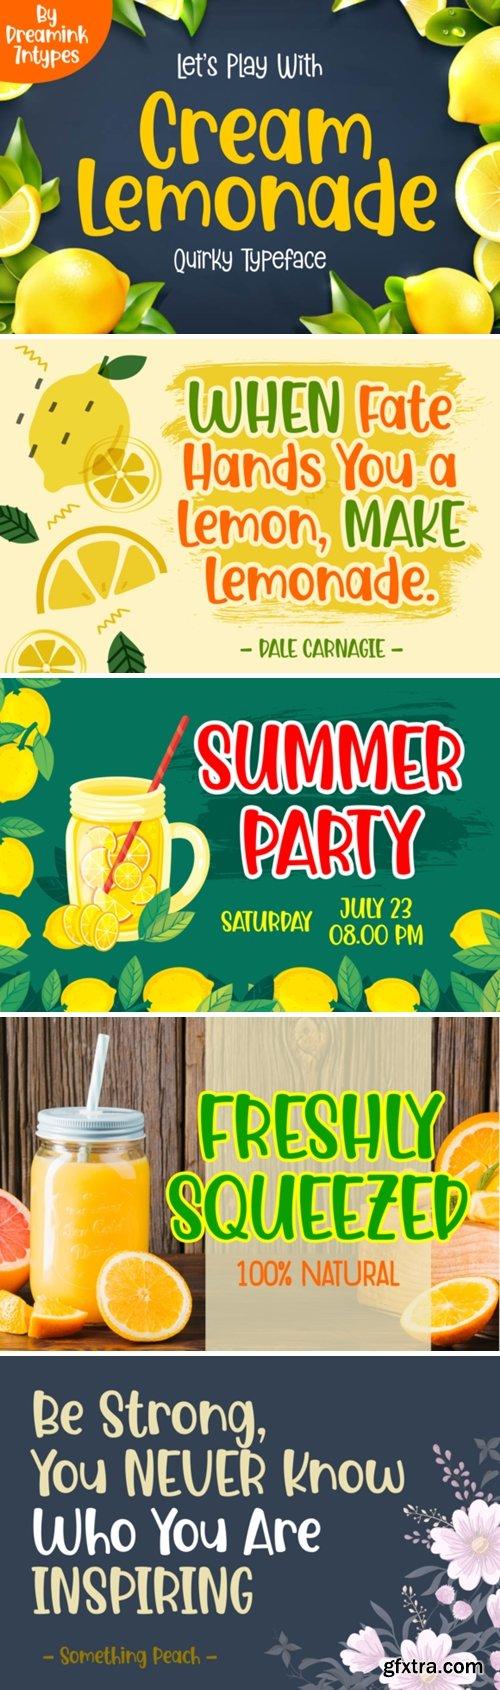 Cream Lemonade Font